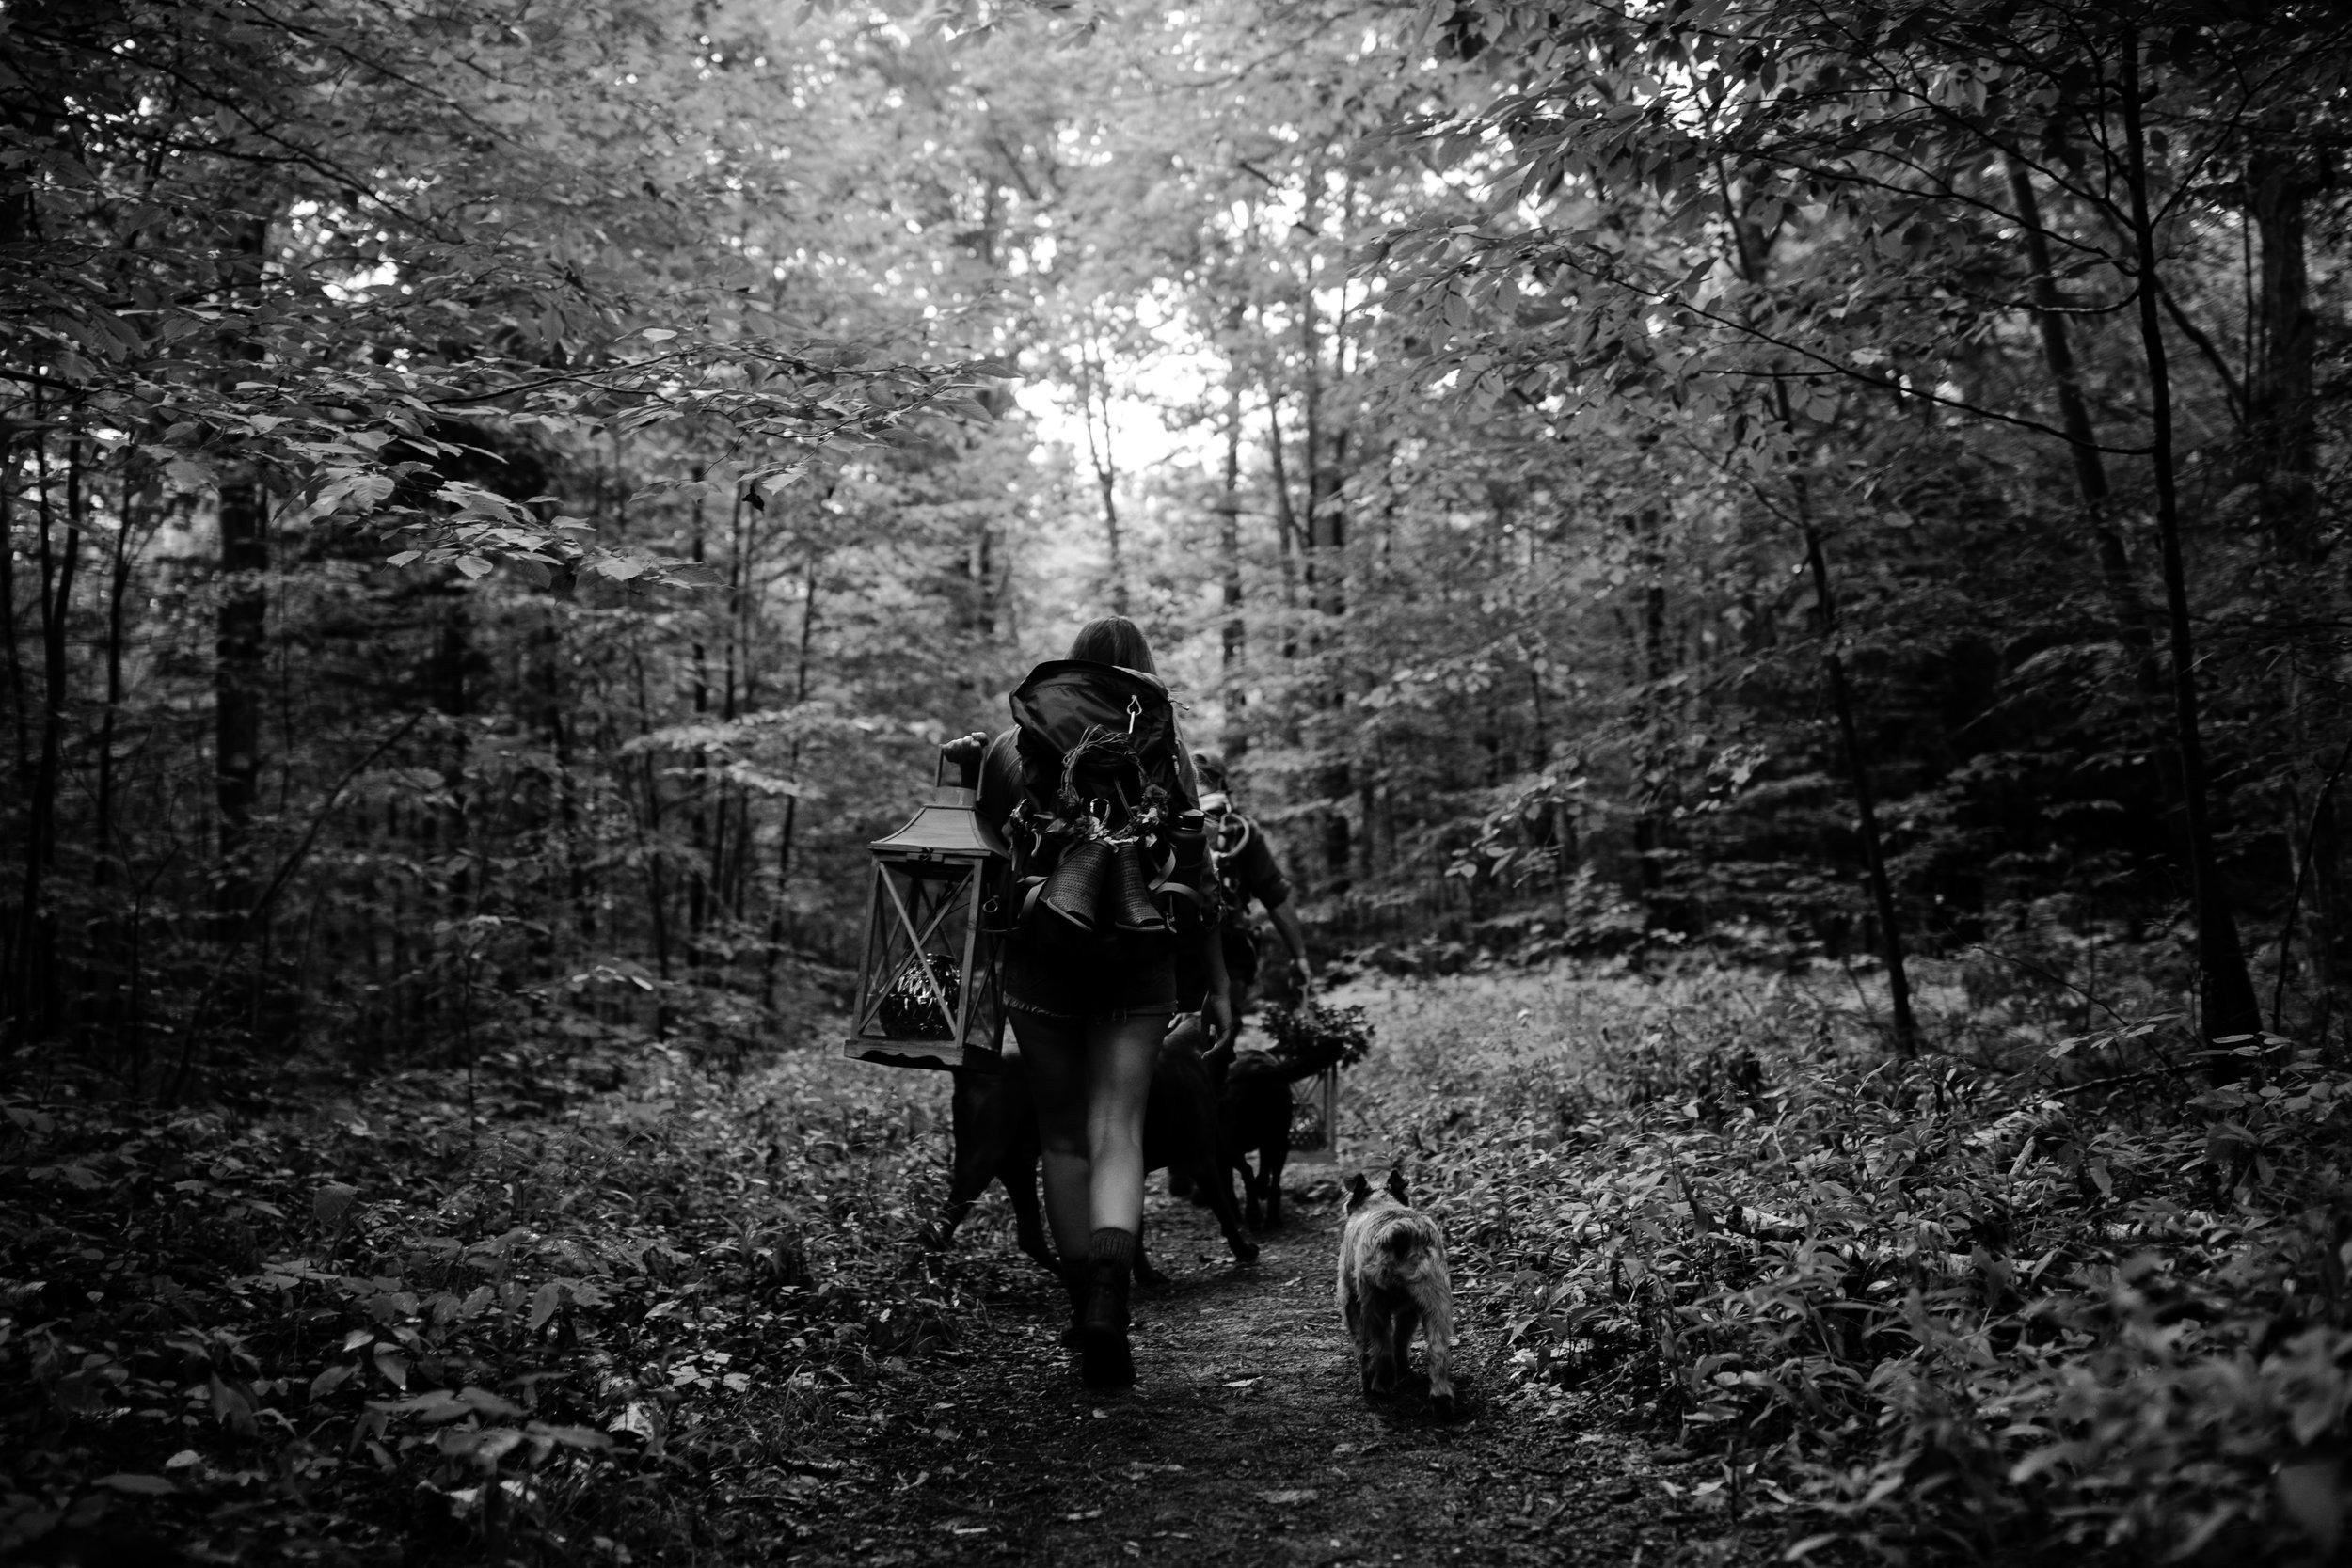 michigan-emotive-photographer-moonlight-elopement-mariha-hunter-18.jpg